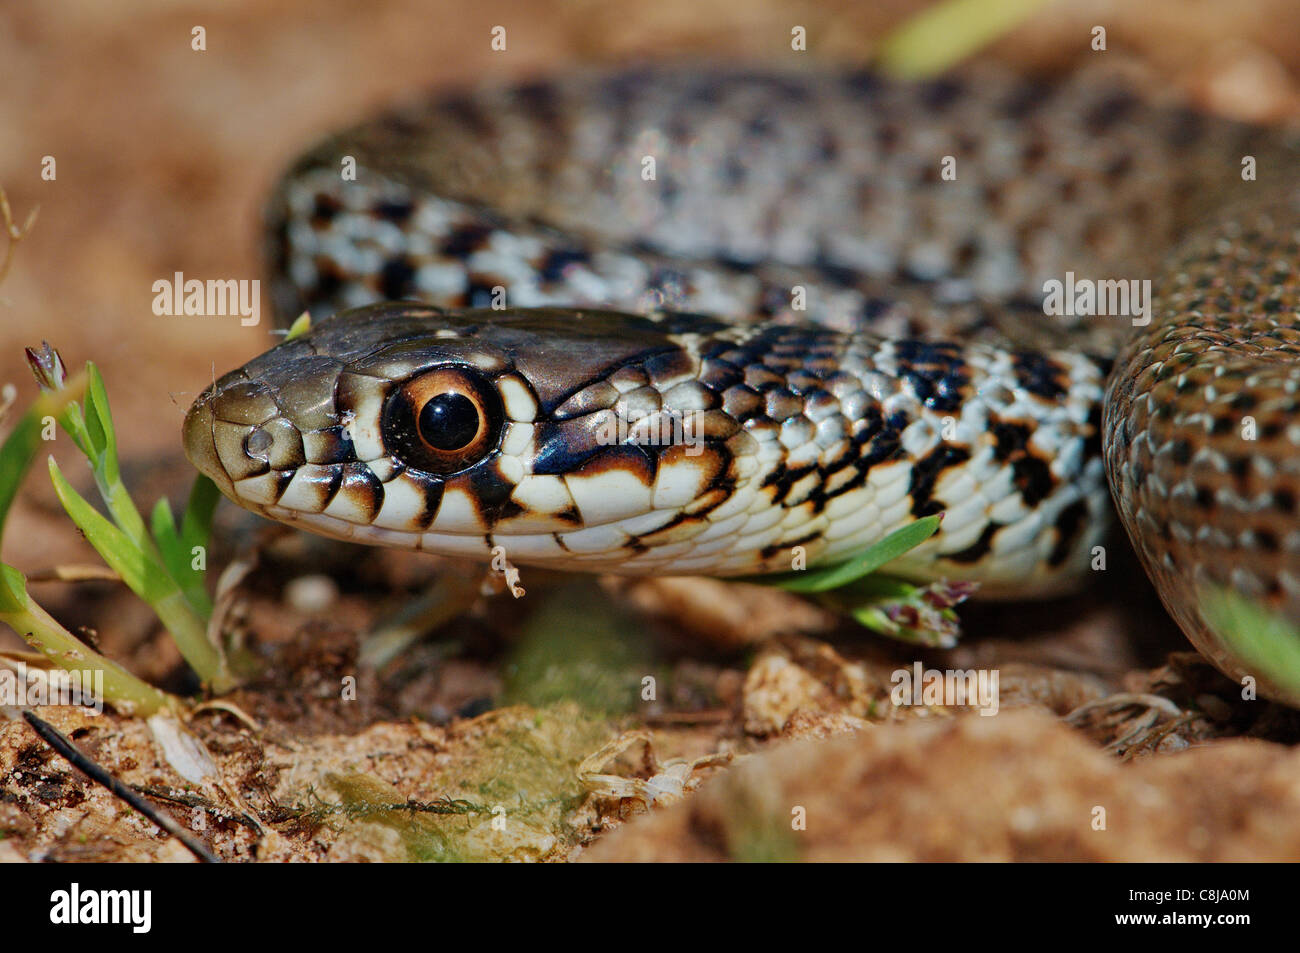 Balkan whip snake, whip snake, racer, colubrid, colubrids, Hierophis gemonensis, snake, snakes, reptile, reptiles, - Stock Image